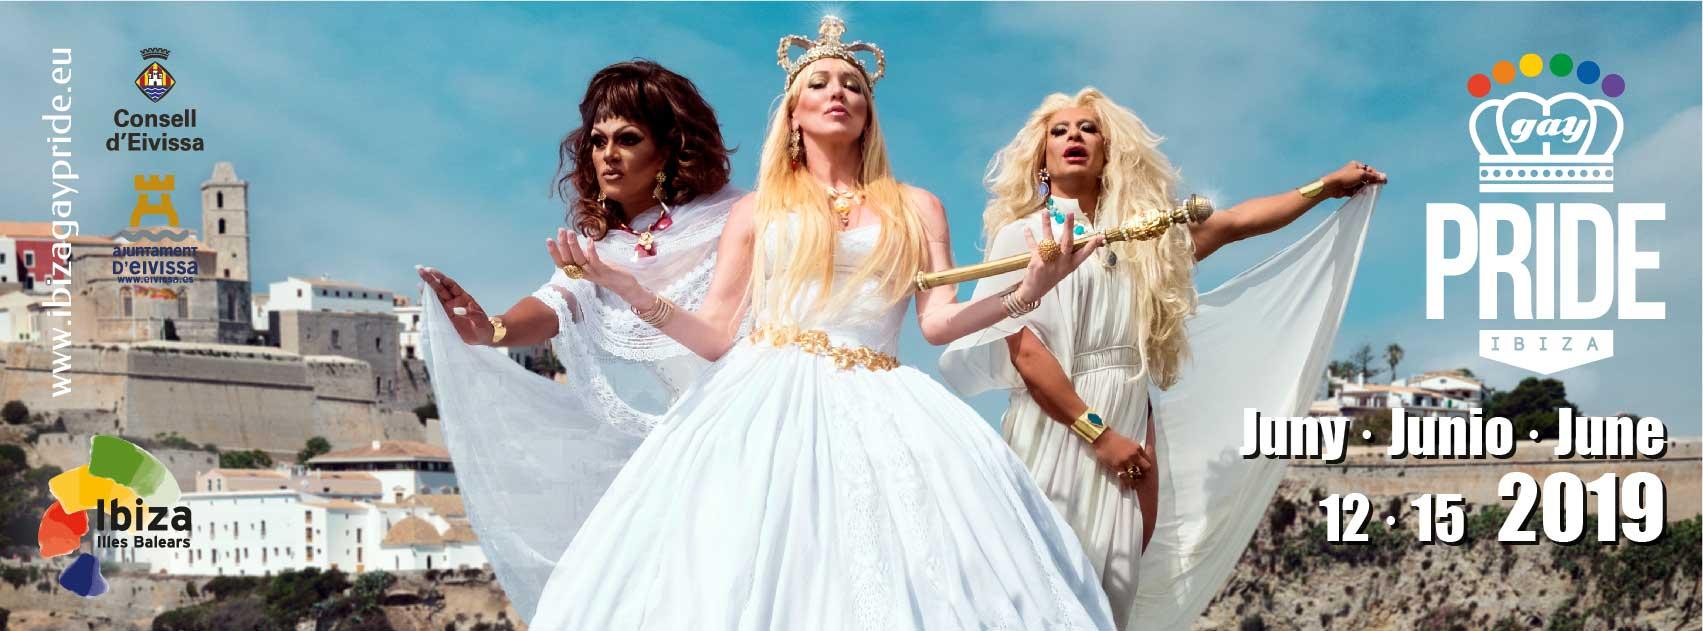 IGPbanner 2019 - Ibiza Gay Pride 2019: motivo de Orgullo